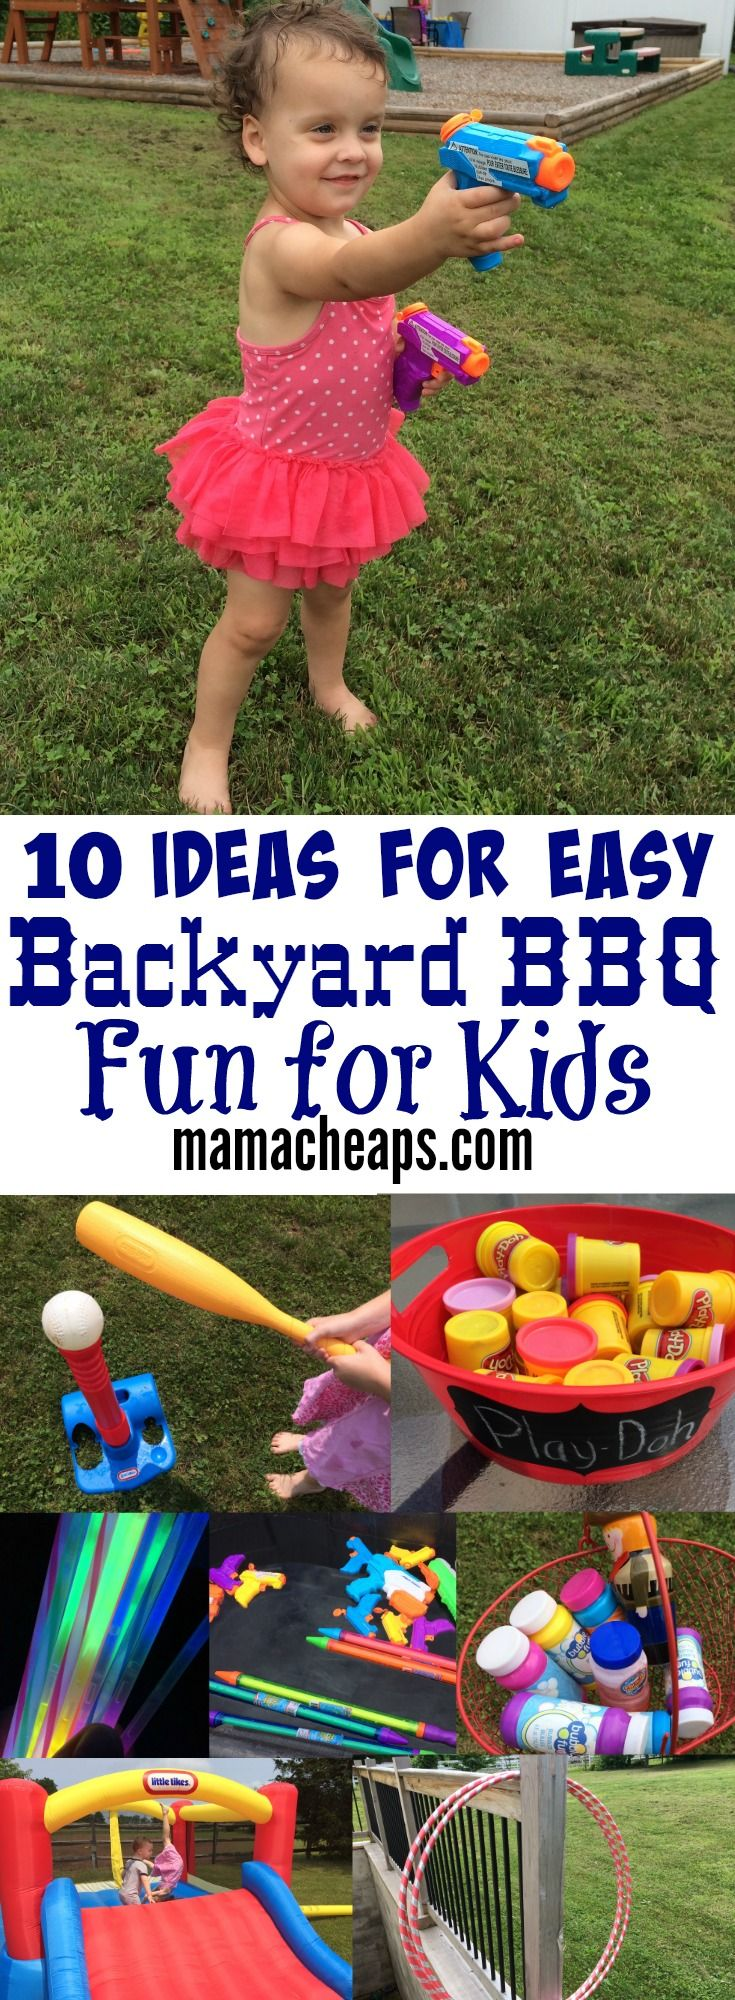 10 Ideas for Easy Backyard BBQ Fun for Kids | KIDS: Summer ...